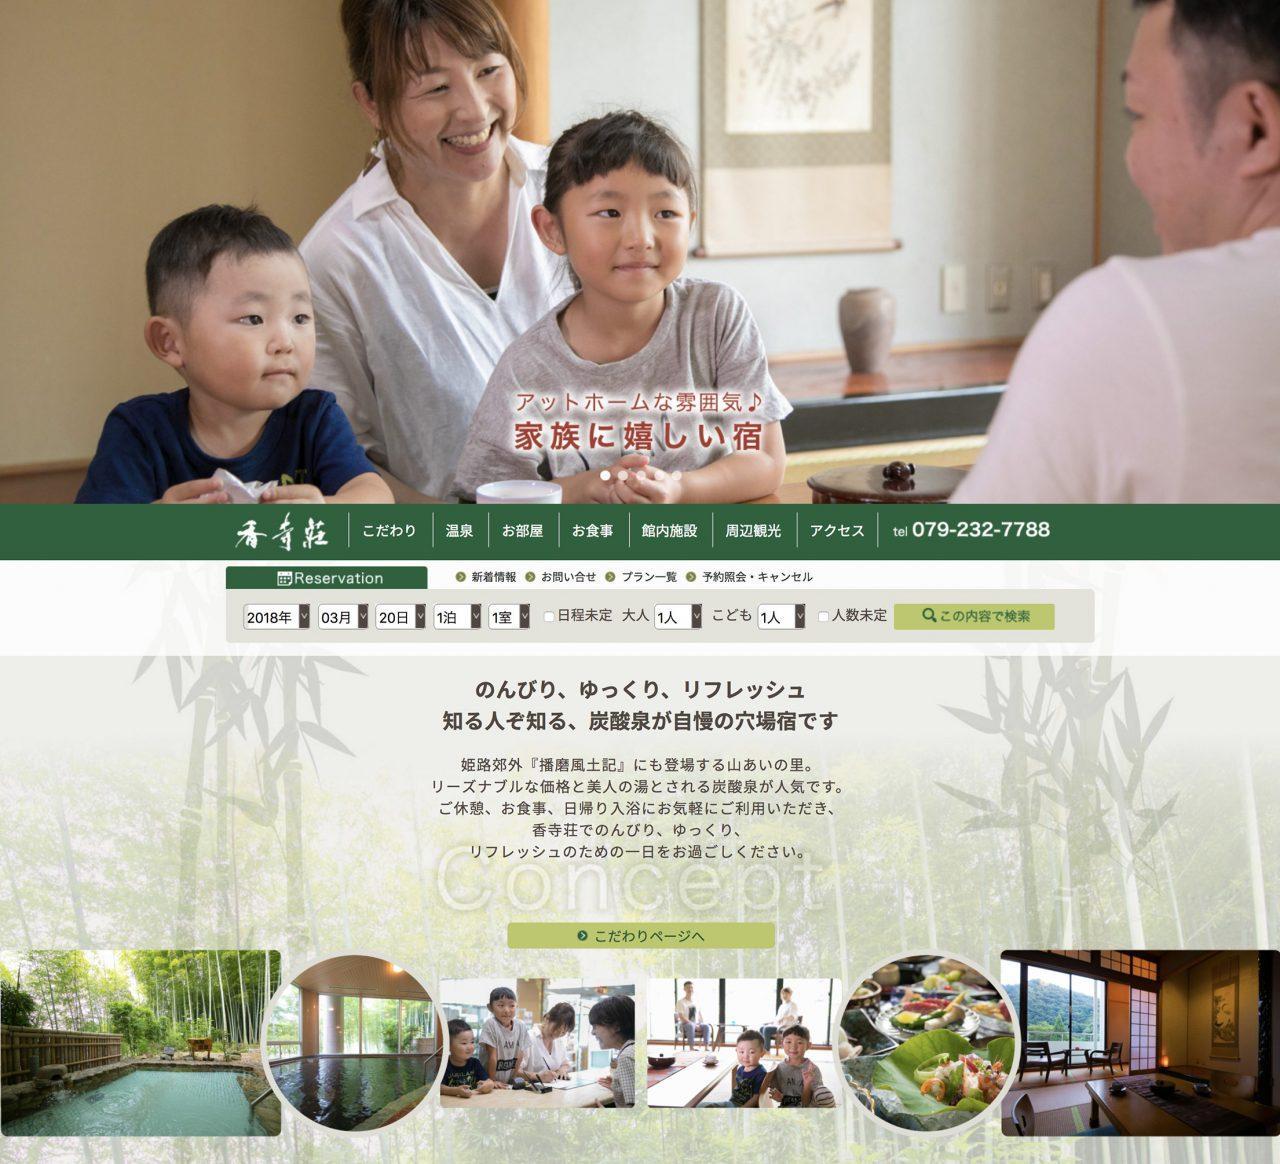 姫路市休養センター 香寺荘